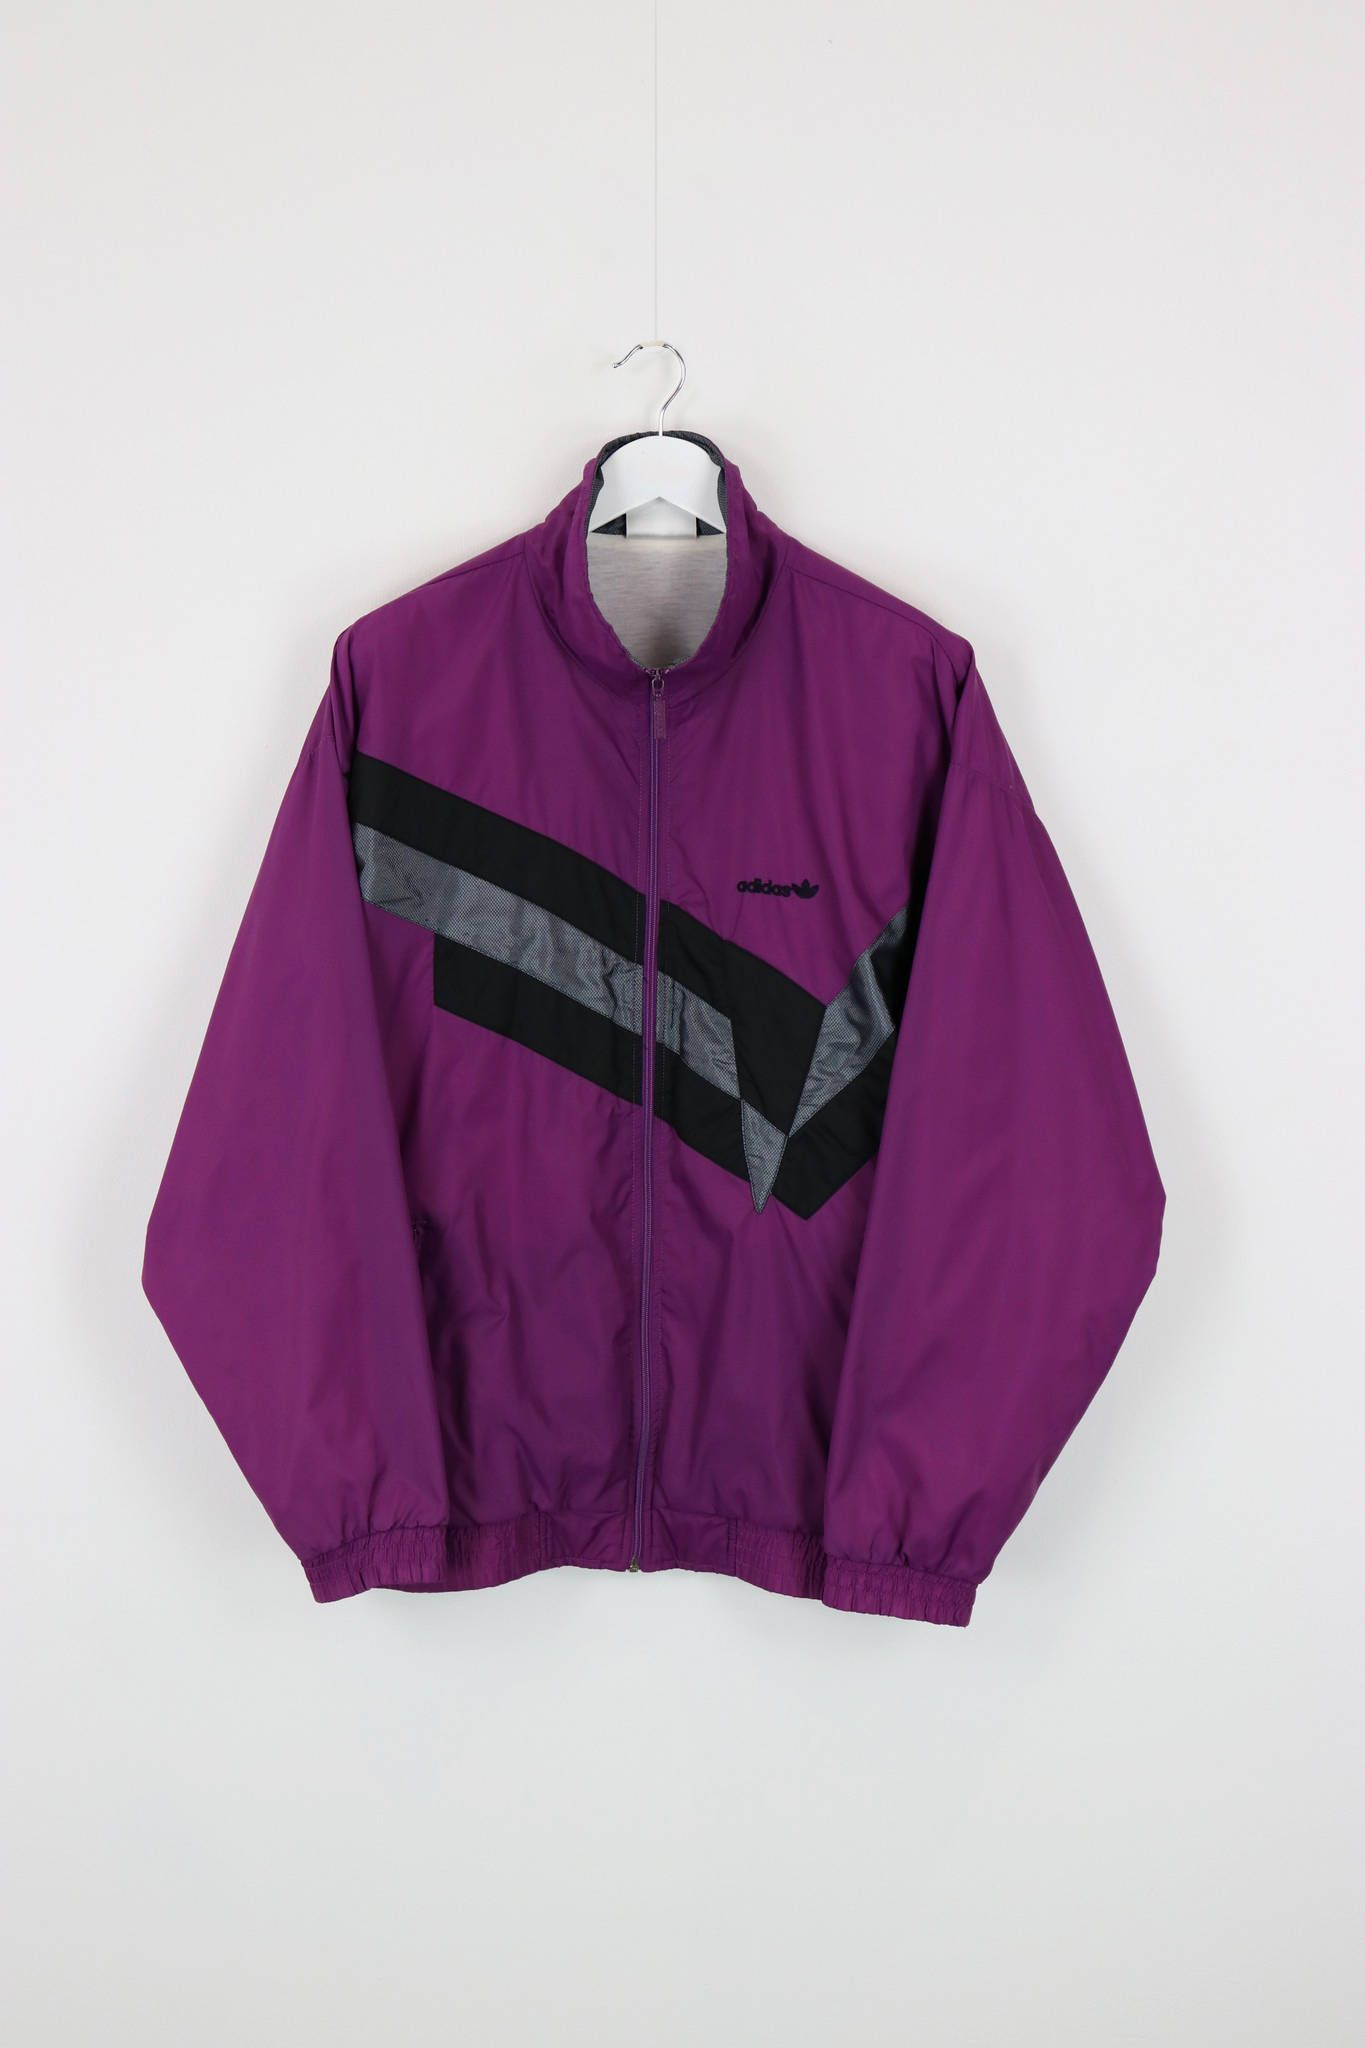 Vintage adidas Trefoil Windbreaker tracksuit Top chaqueta púrpura / negro